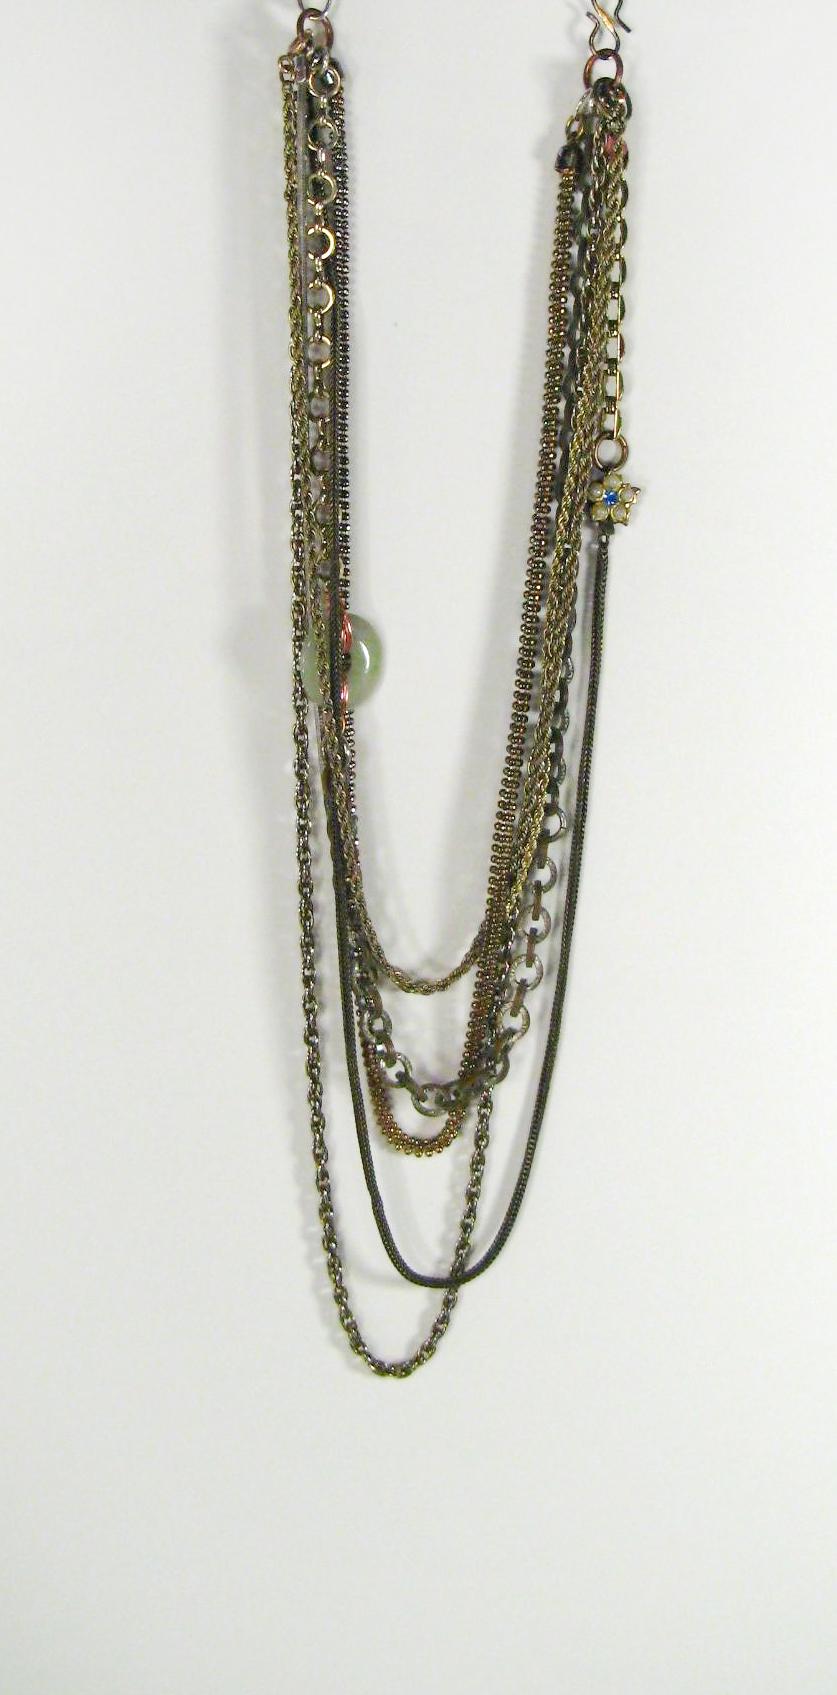 RJM_rjmartist_Caldwell_Sidney_necklace.jpg